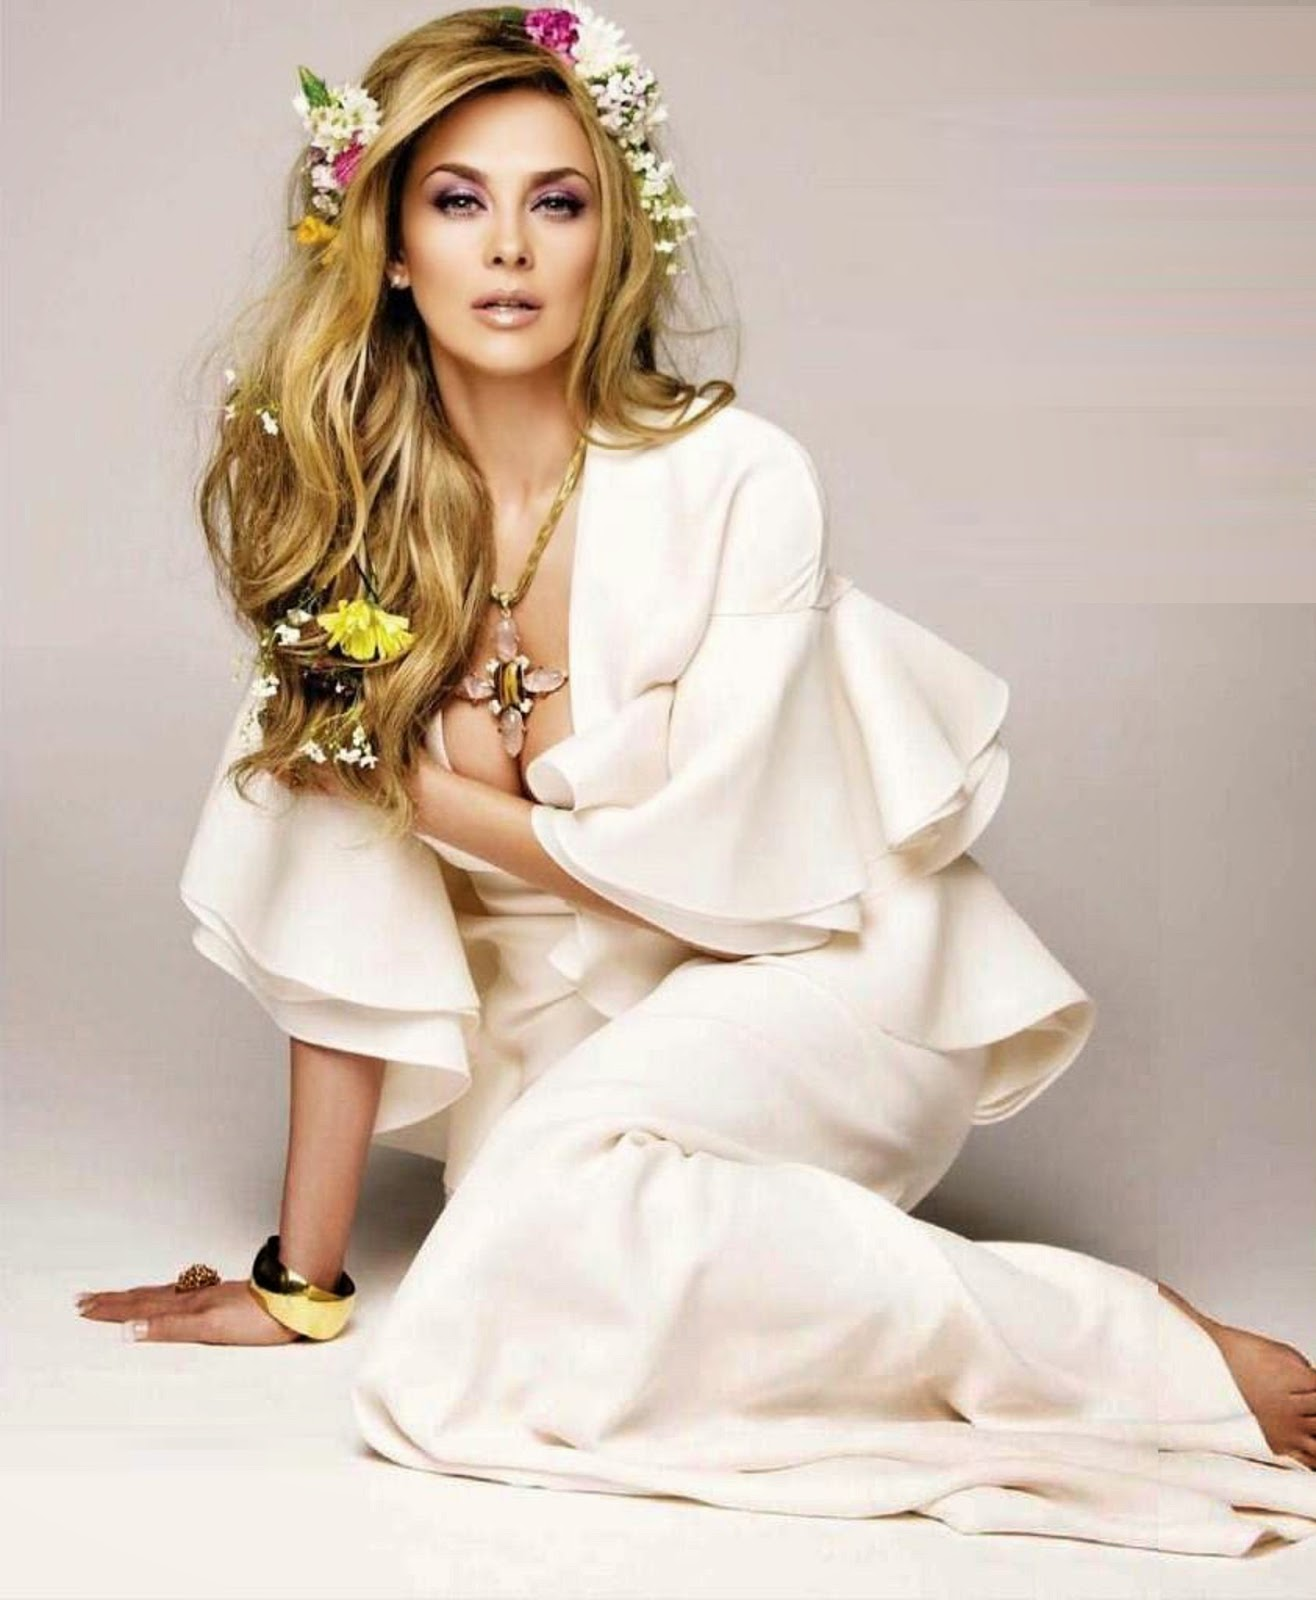 Hollywood Actress Wallpaper: Aracely Arambula HD Wallpapers